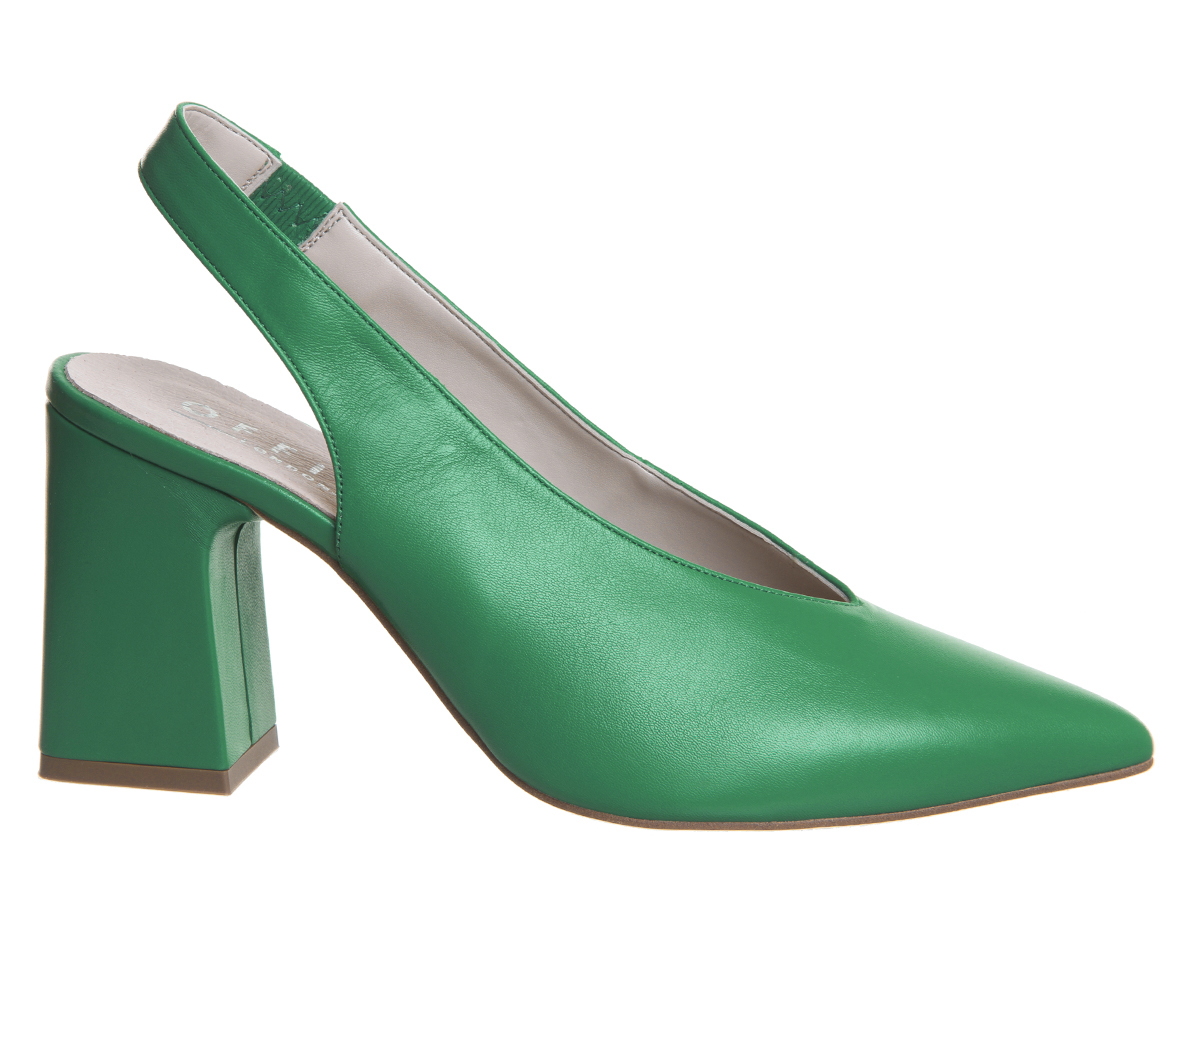 Damenschuhe Office Mimi JADE Chunky Slingback Heels JADE Mimi GREEN LEATHER Heels d3549b